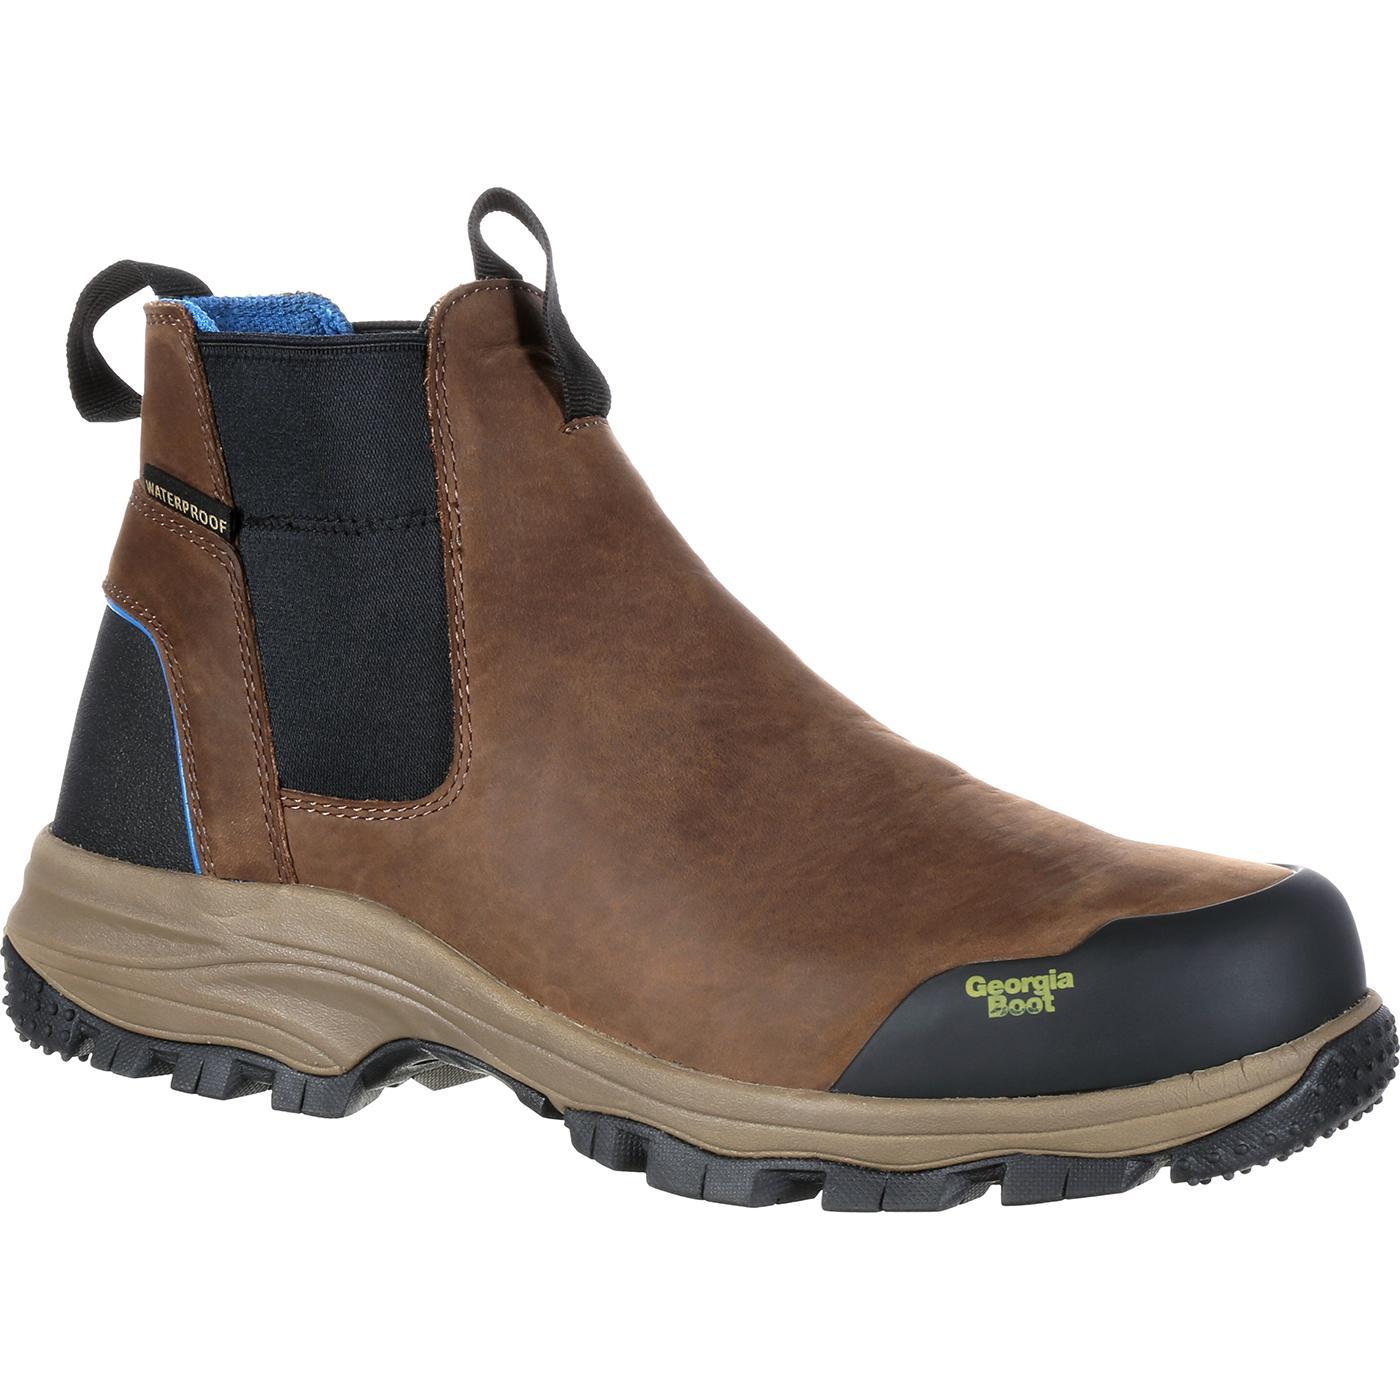 c82692471a1 Georgia Boot Blue Collar Chelsea Waterproof Work Romeo Boot